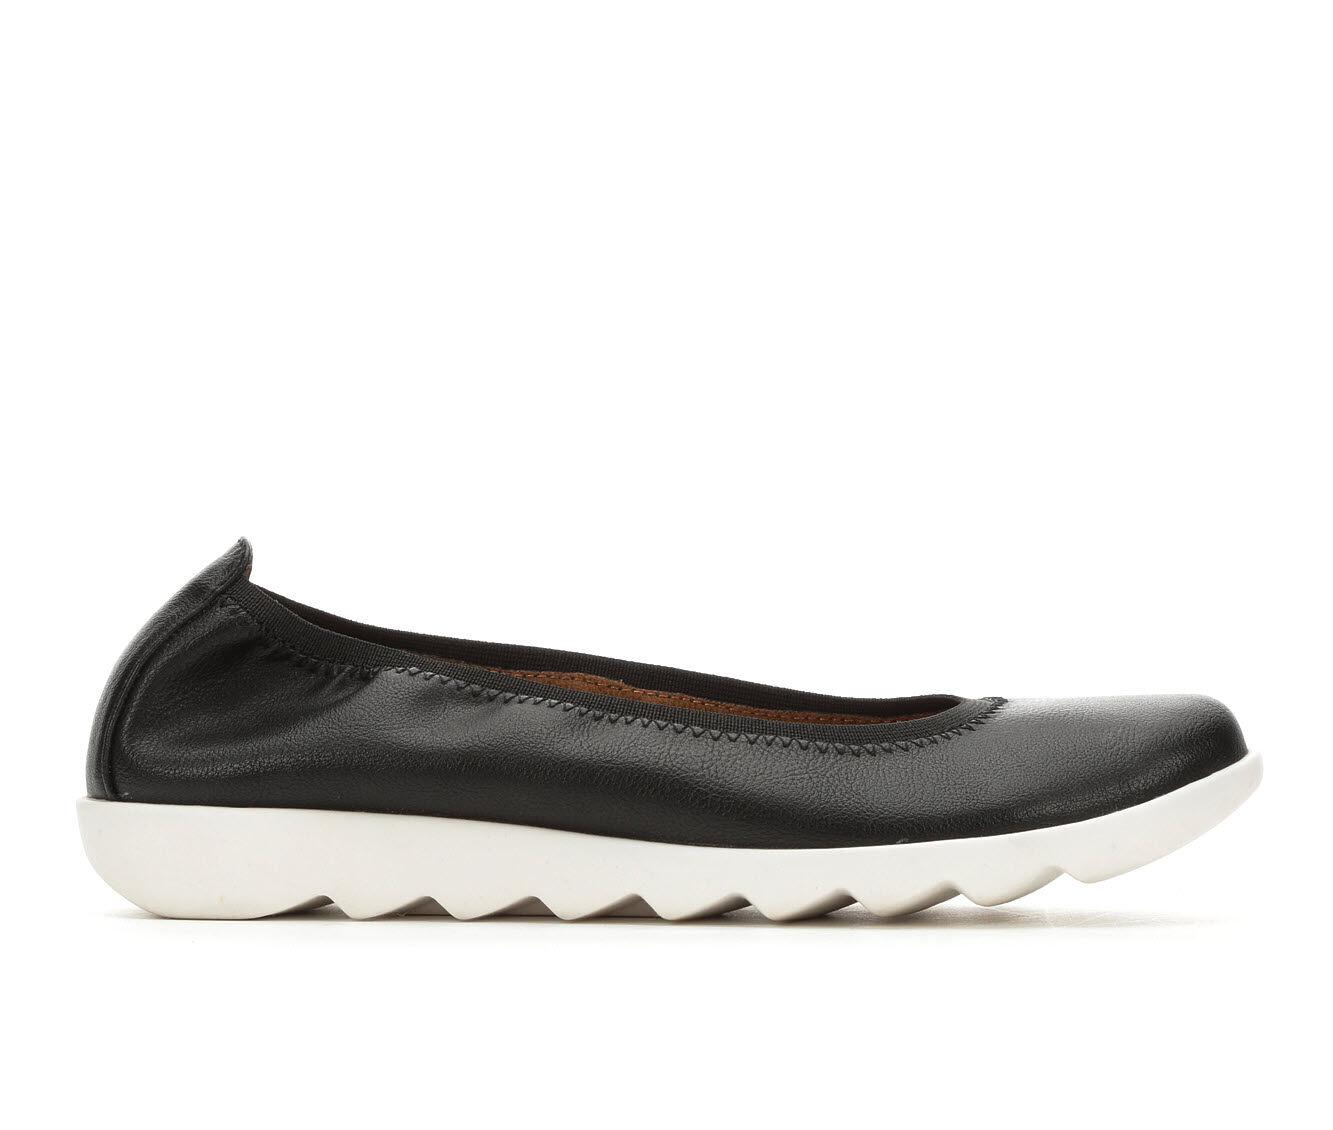 Buy Cheap Women's Vintage 7 Eight Grace Slip-On Shoes Black